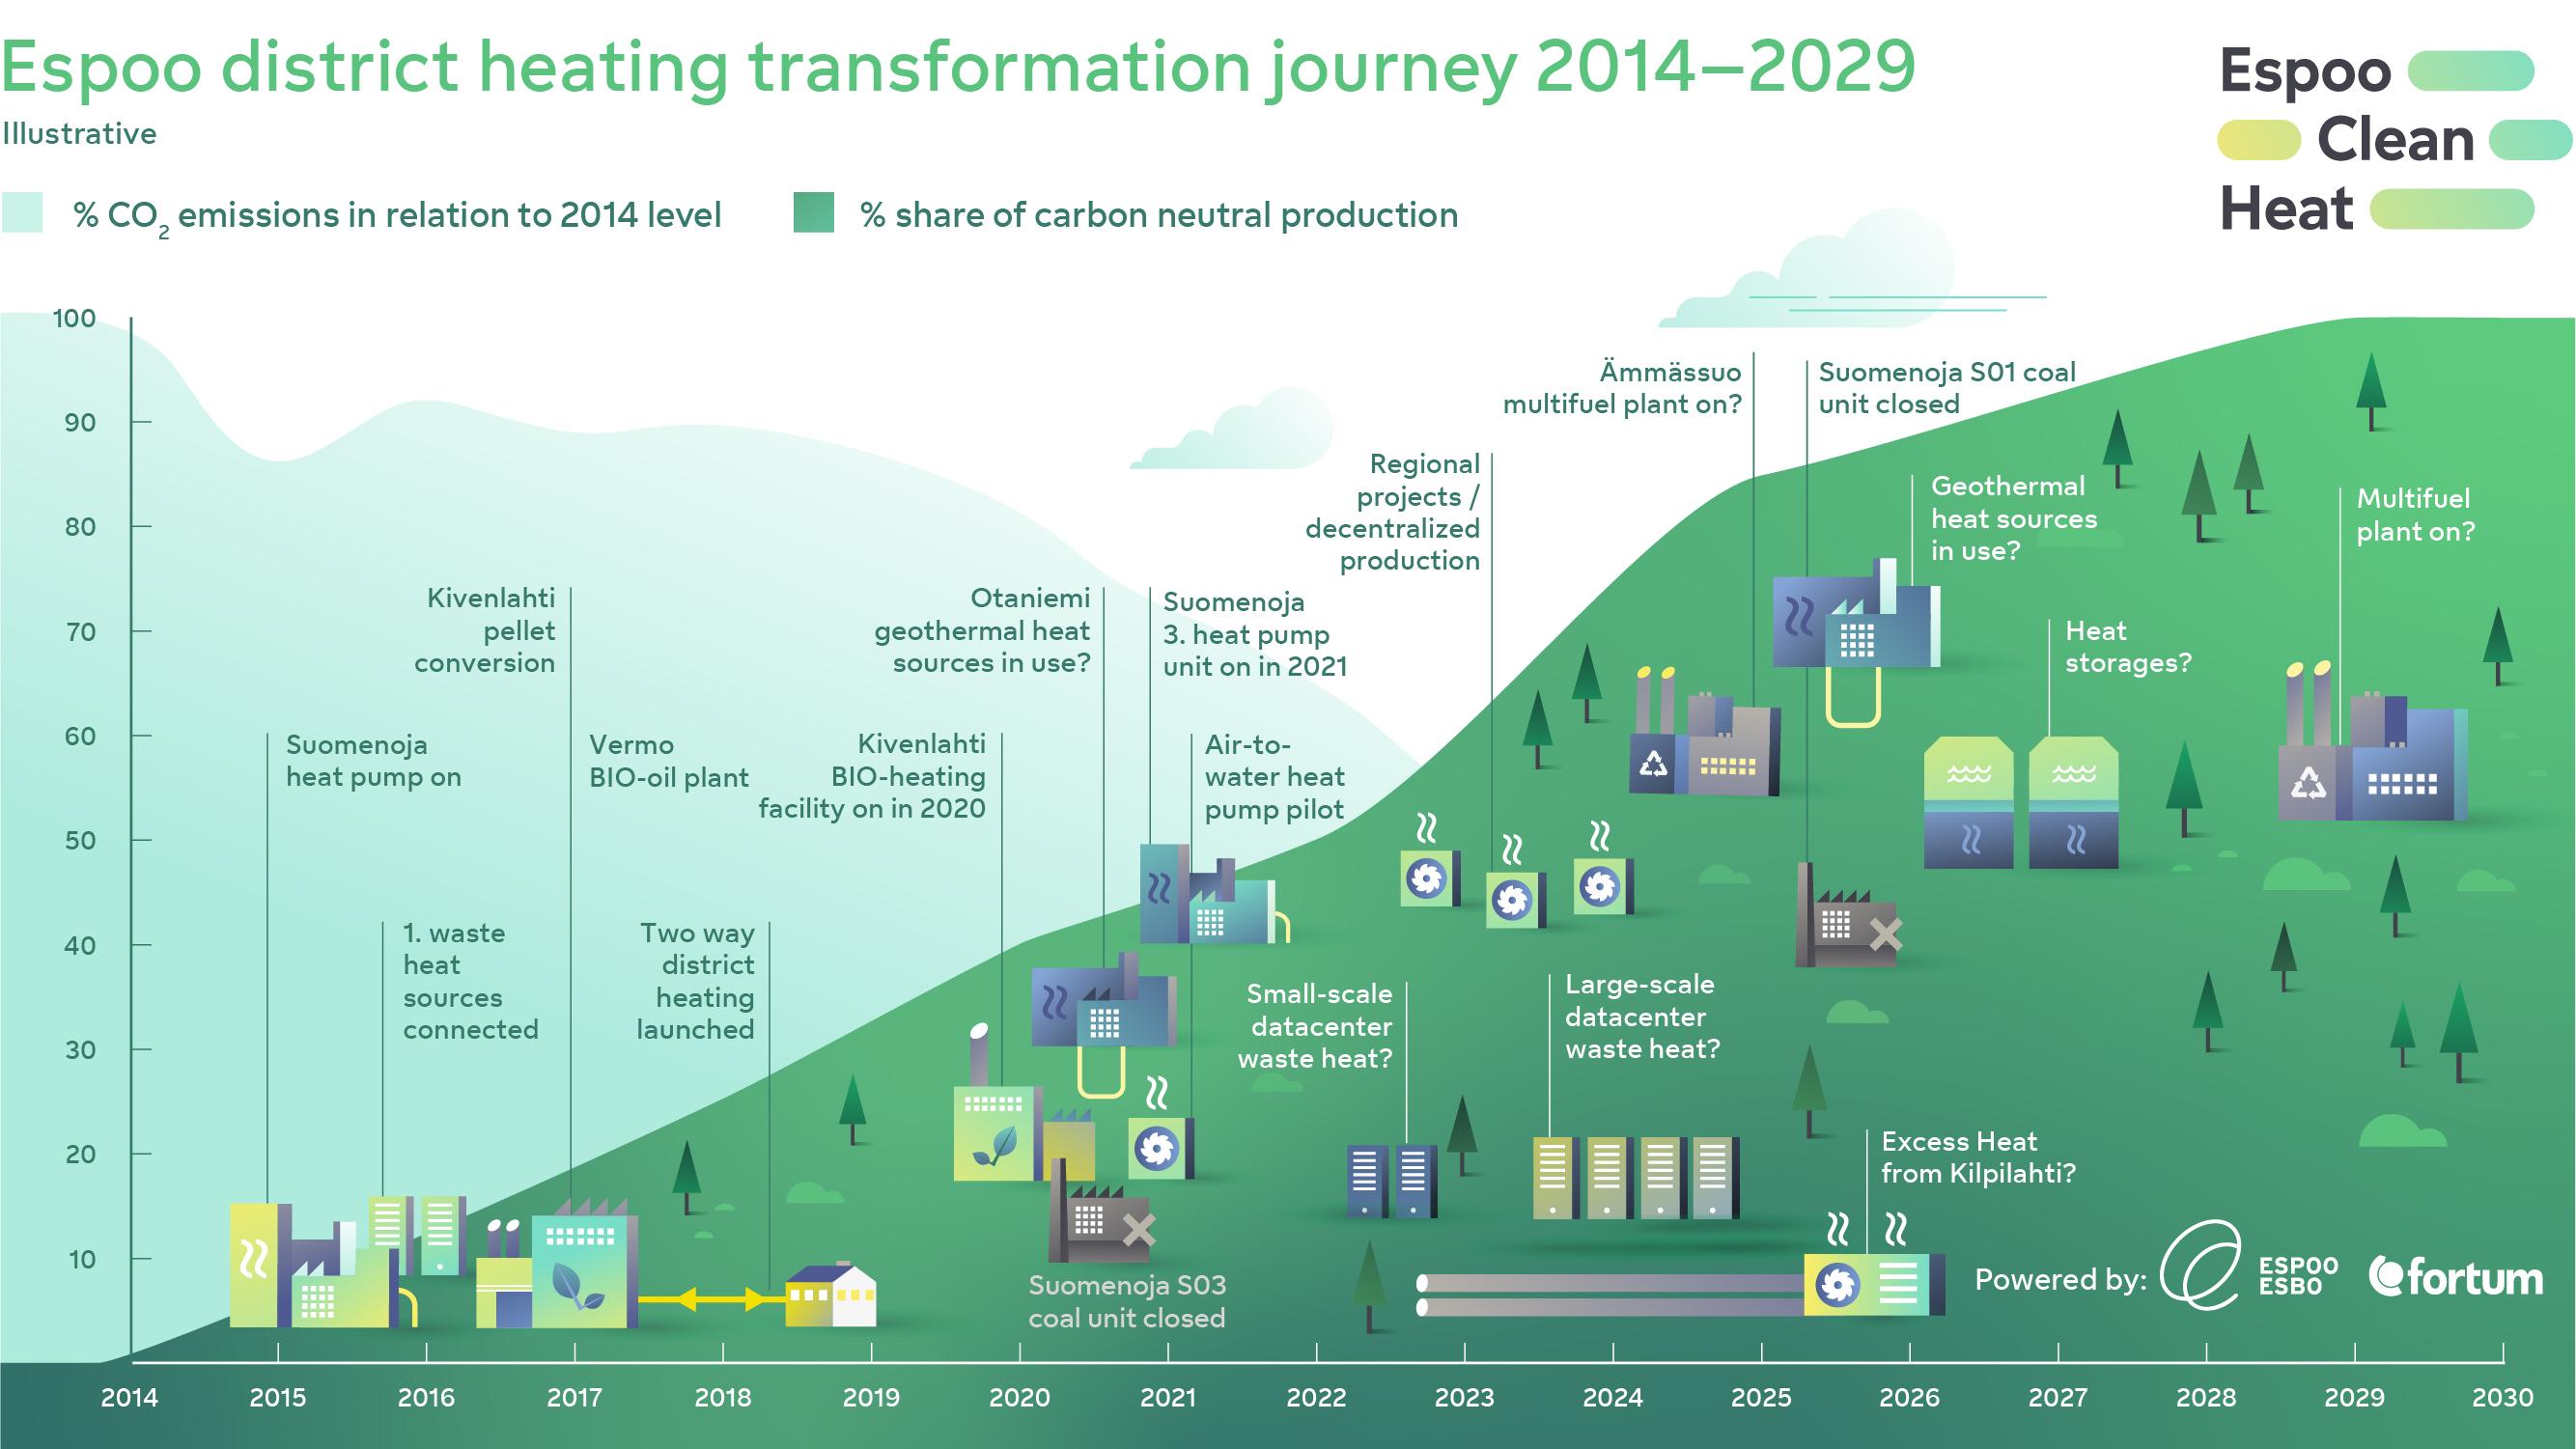 Espoo district heating transformation journey 2014-2029